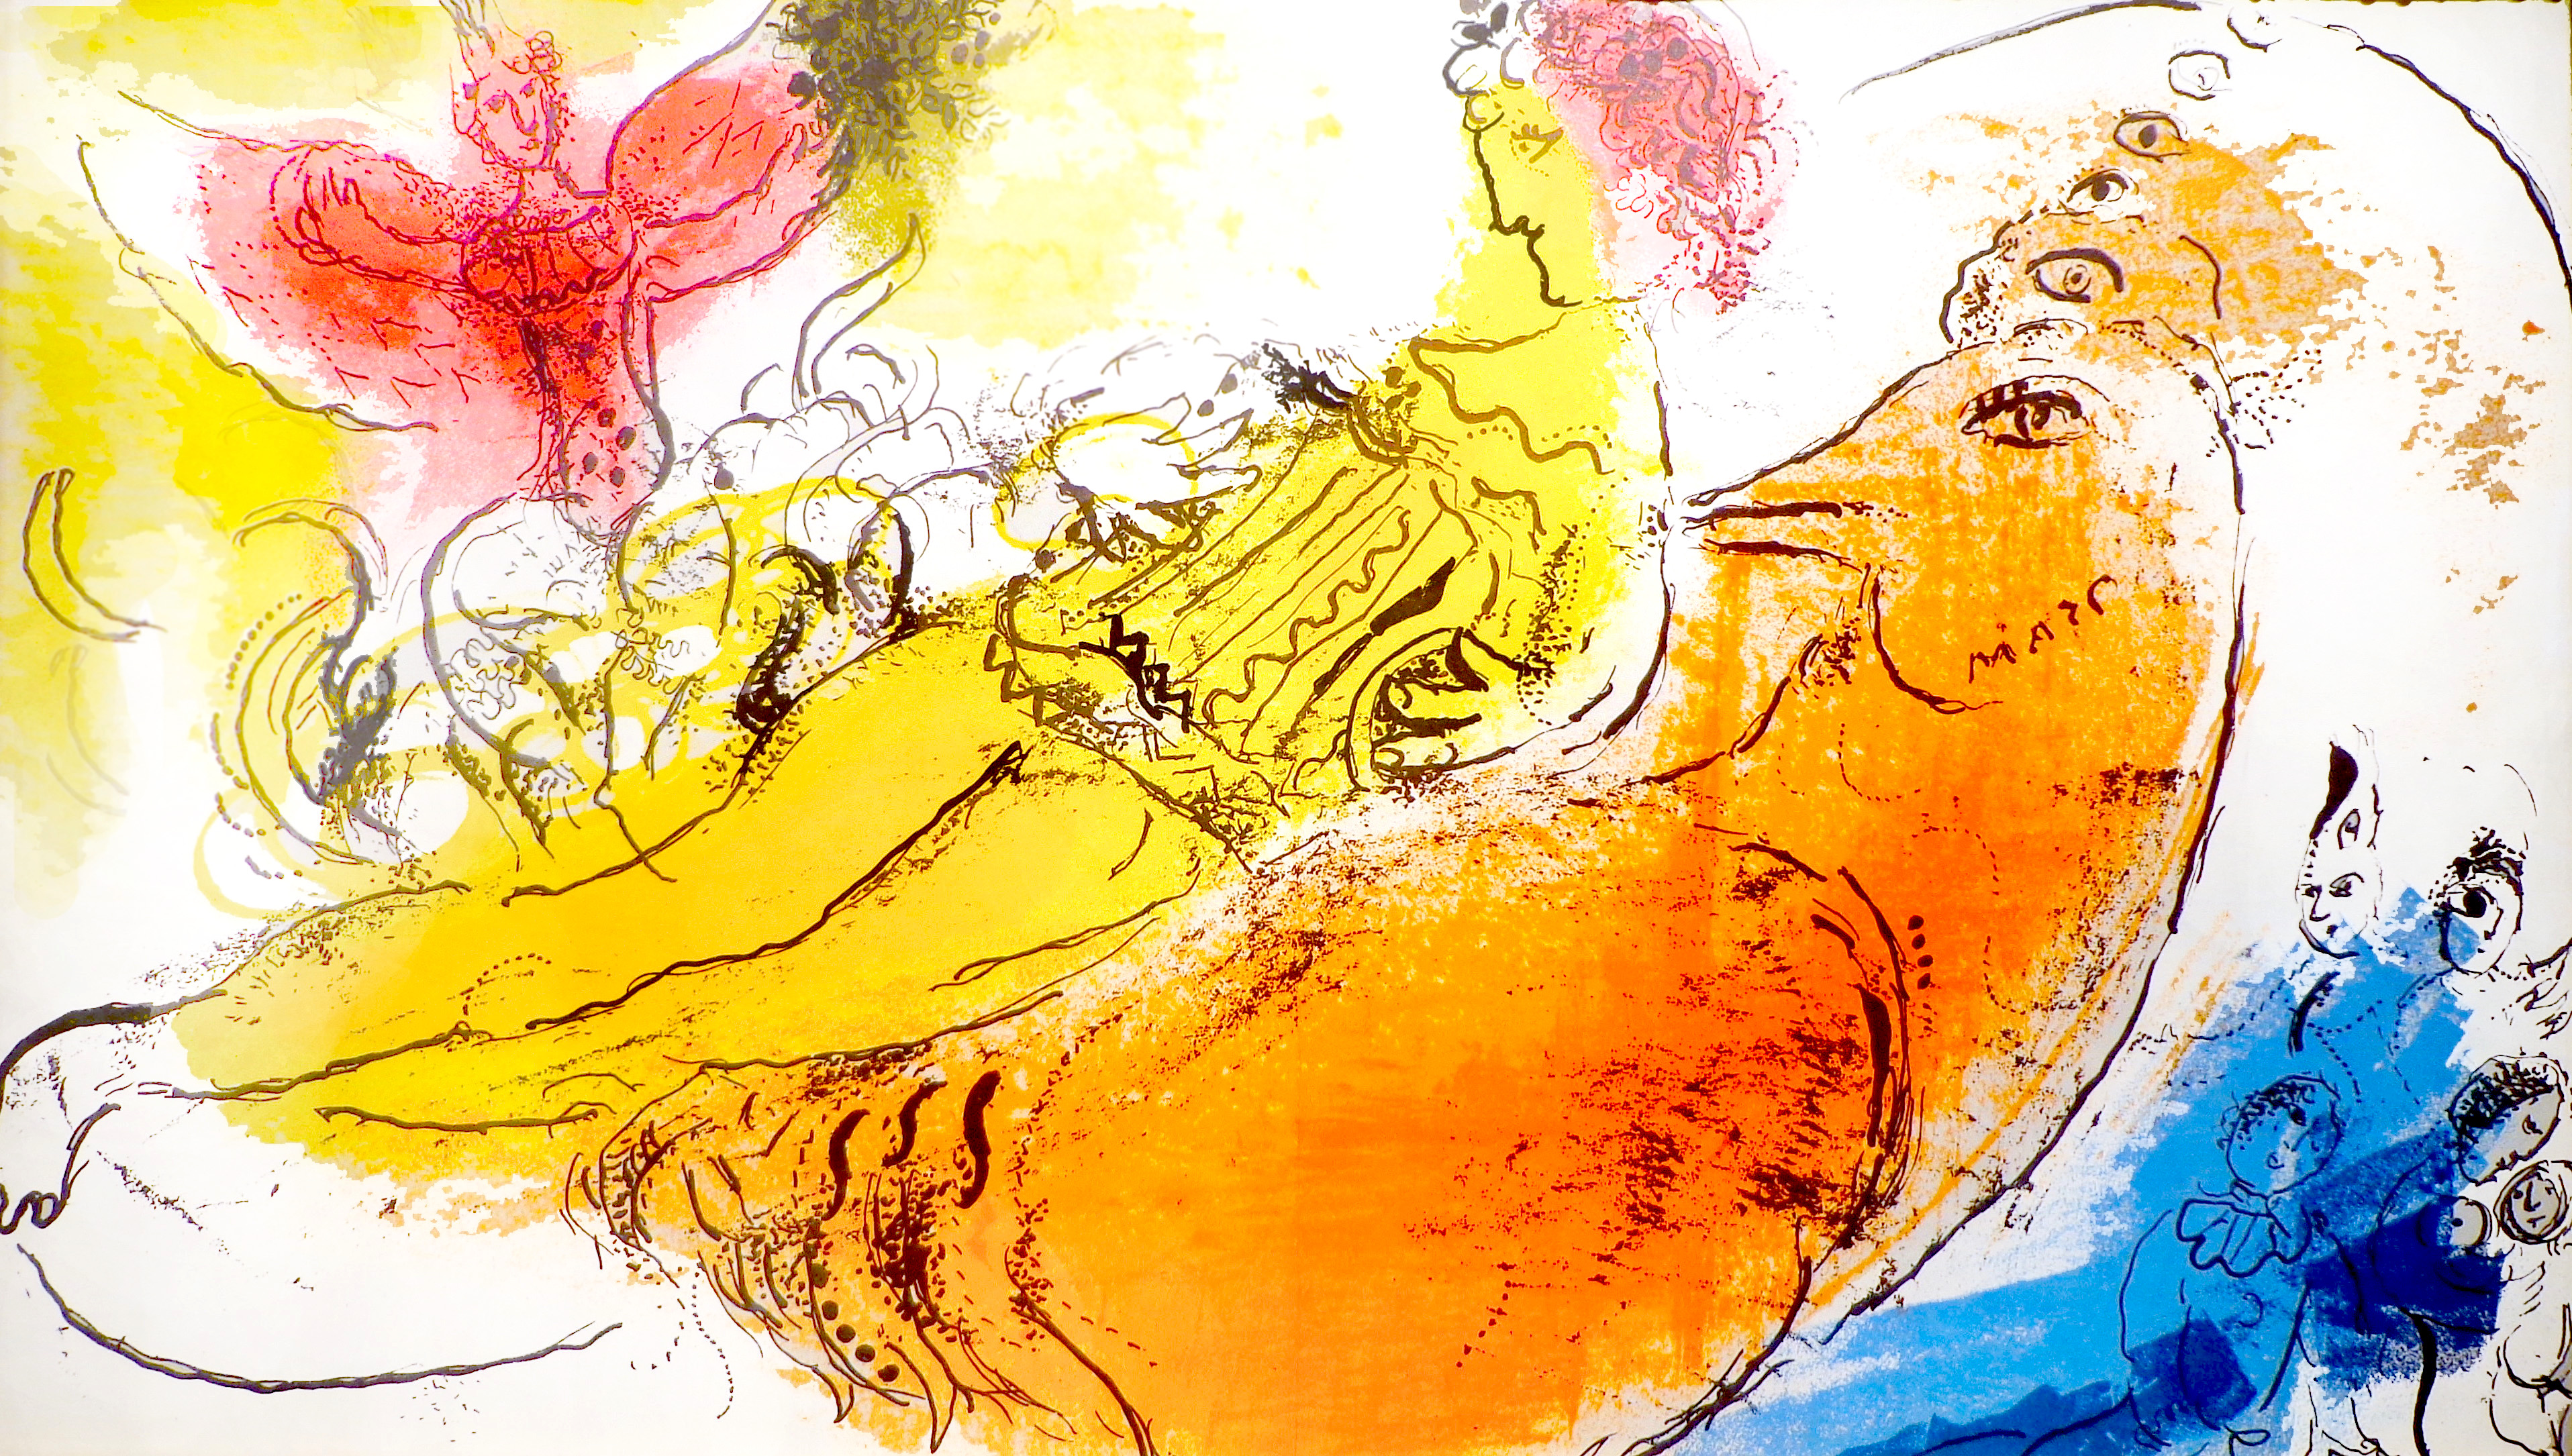 Chagall, Accordion Player